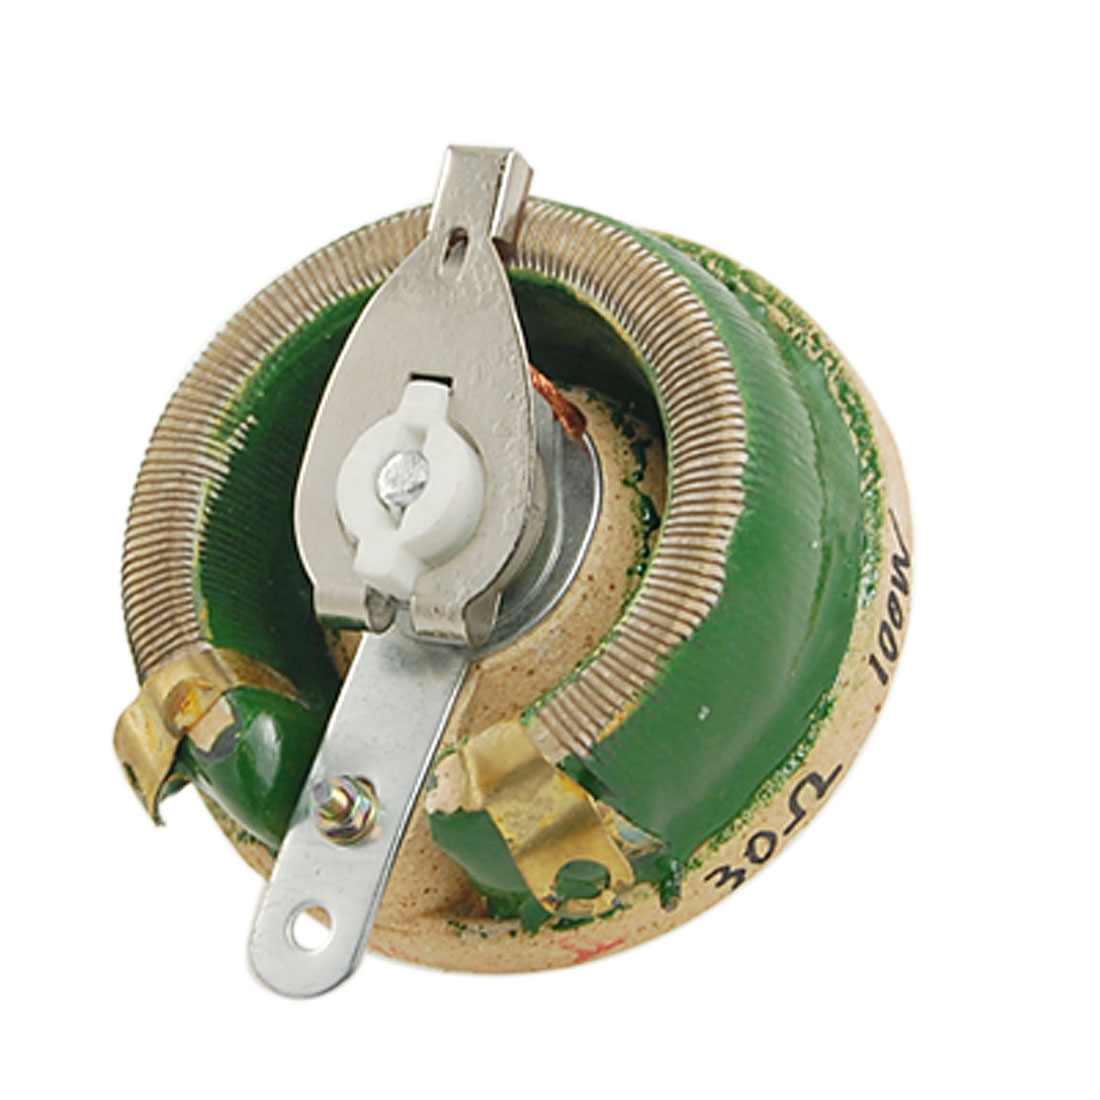 Ceramic Disk Variable Resistor Rheostat 100W Watt 30 Ohm